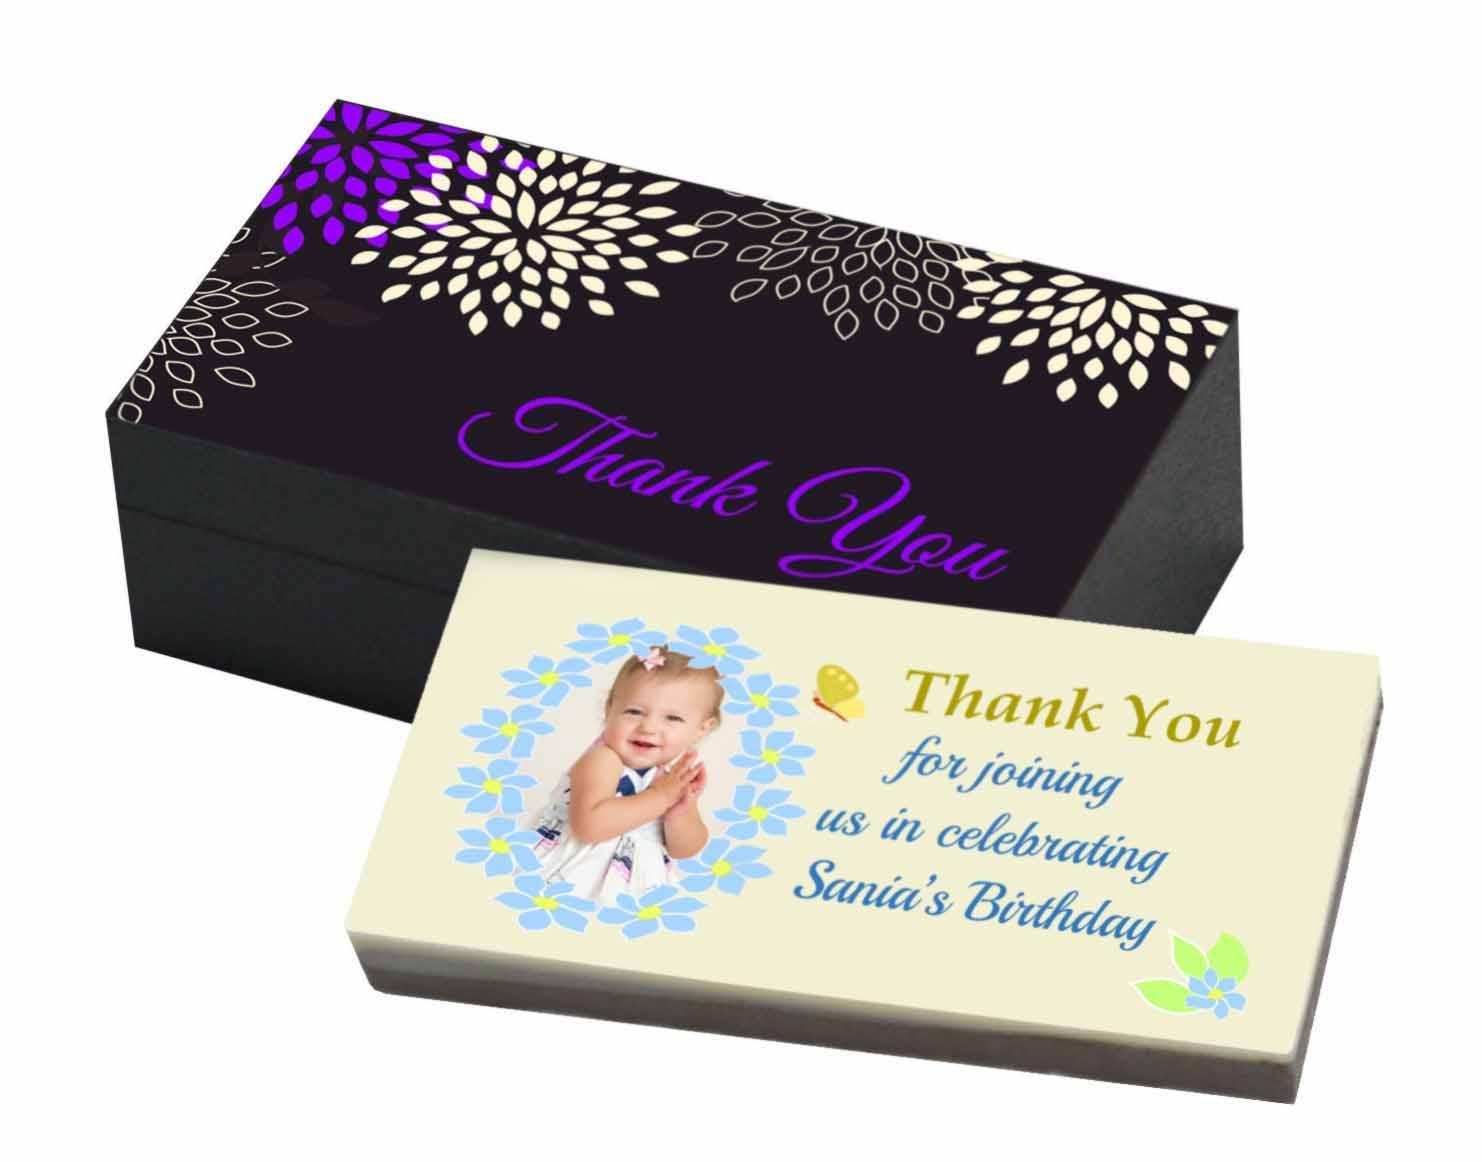 Customized Birthday Return Gifts